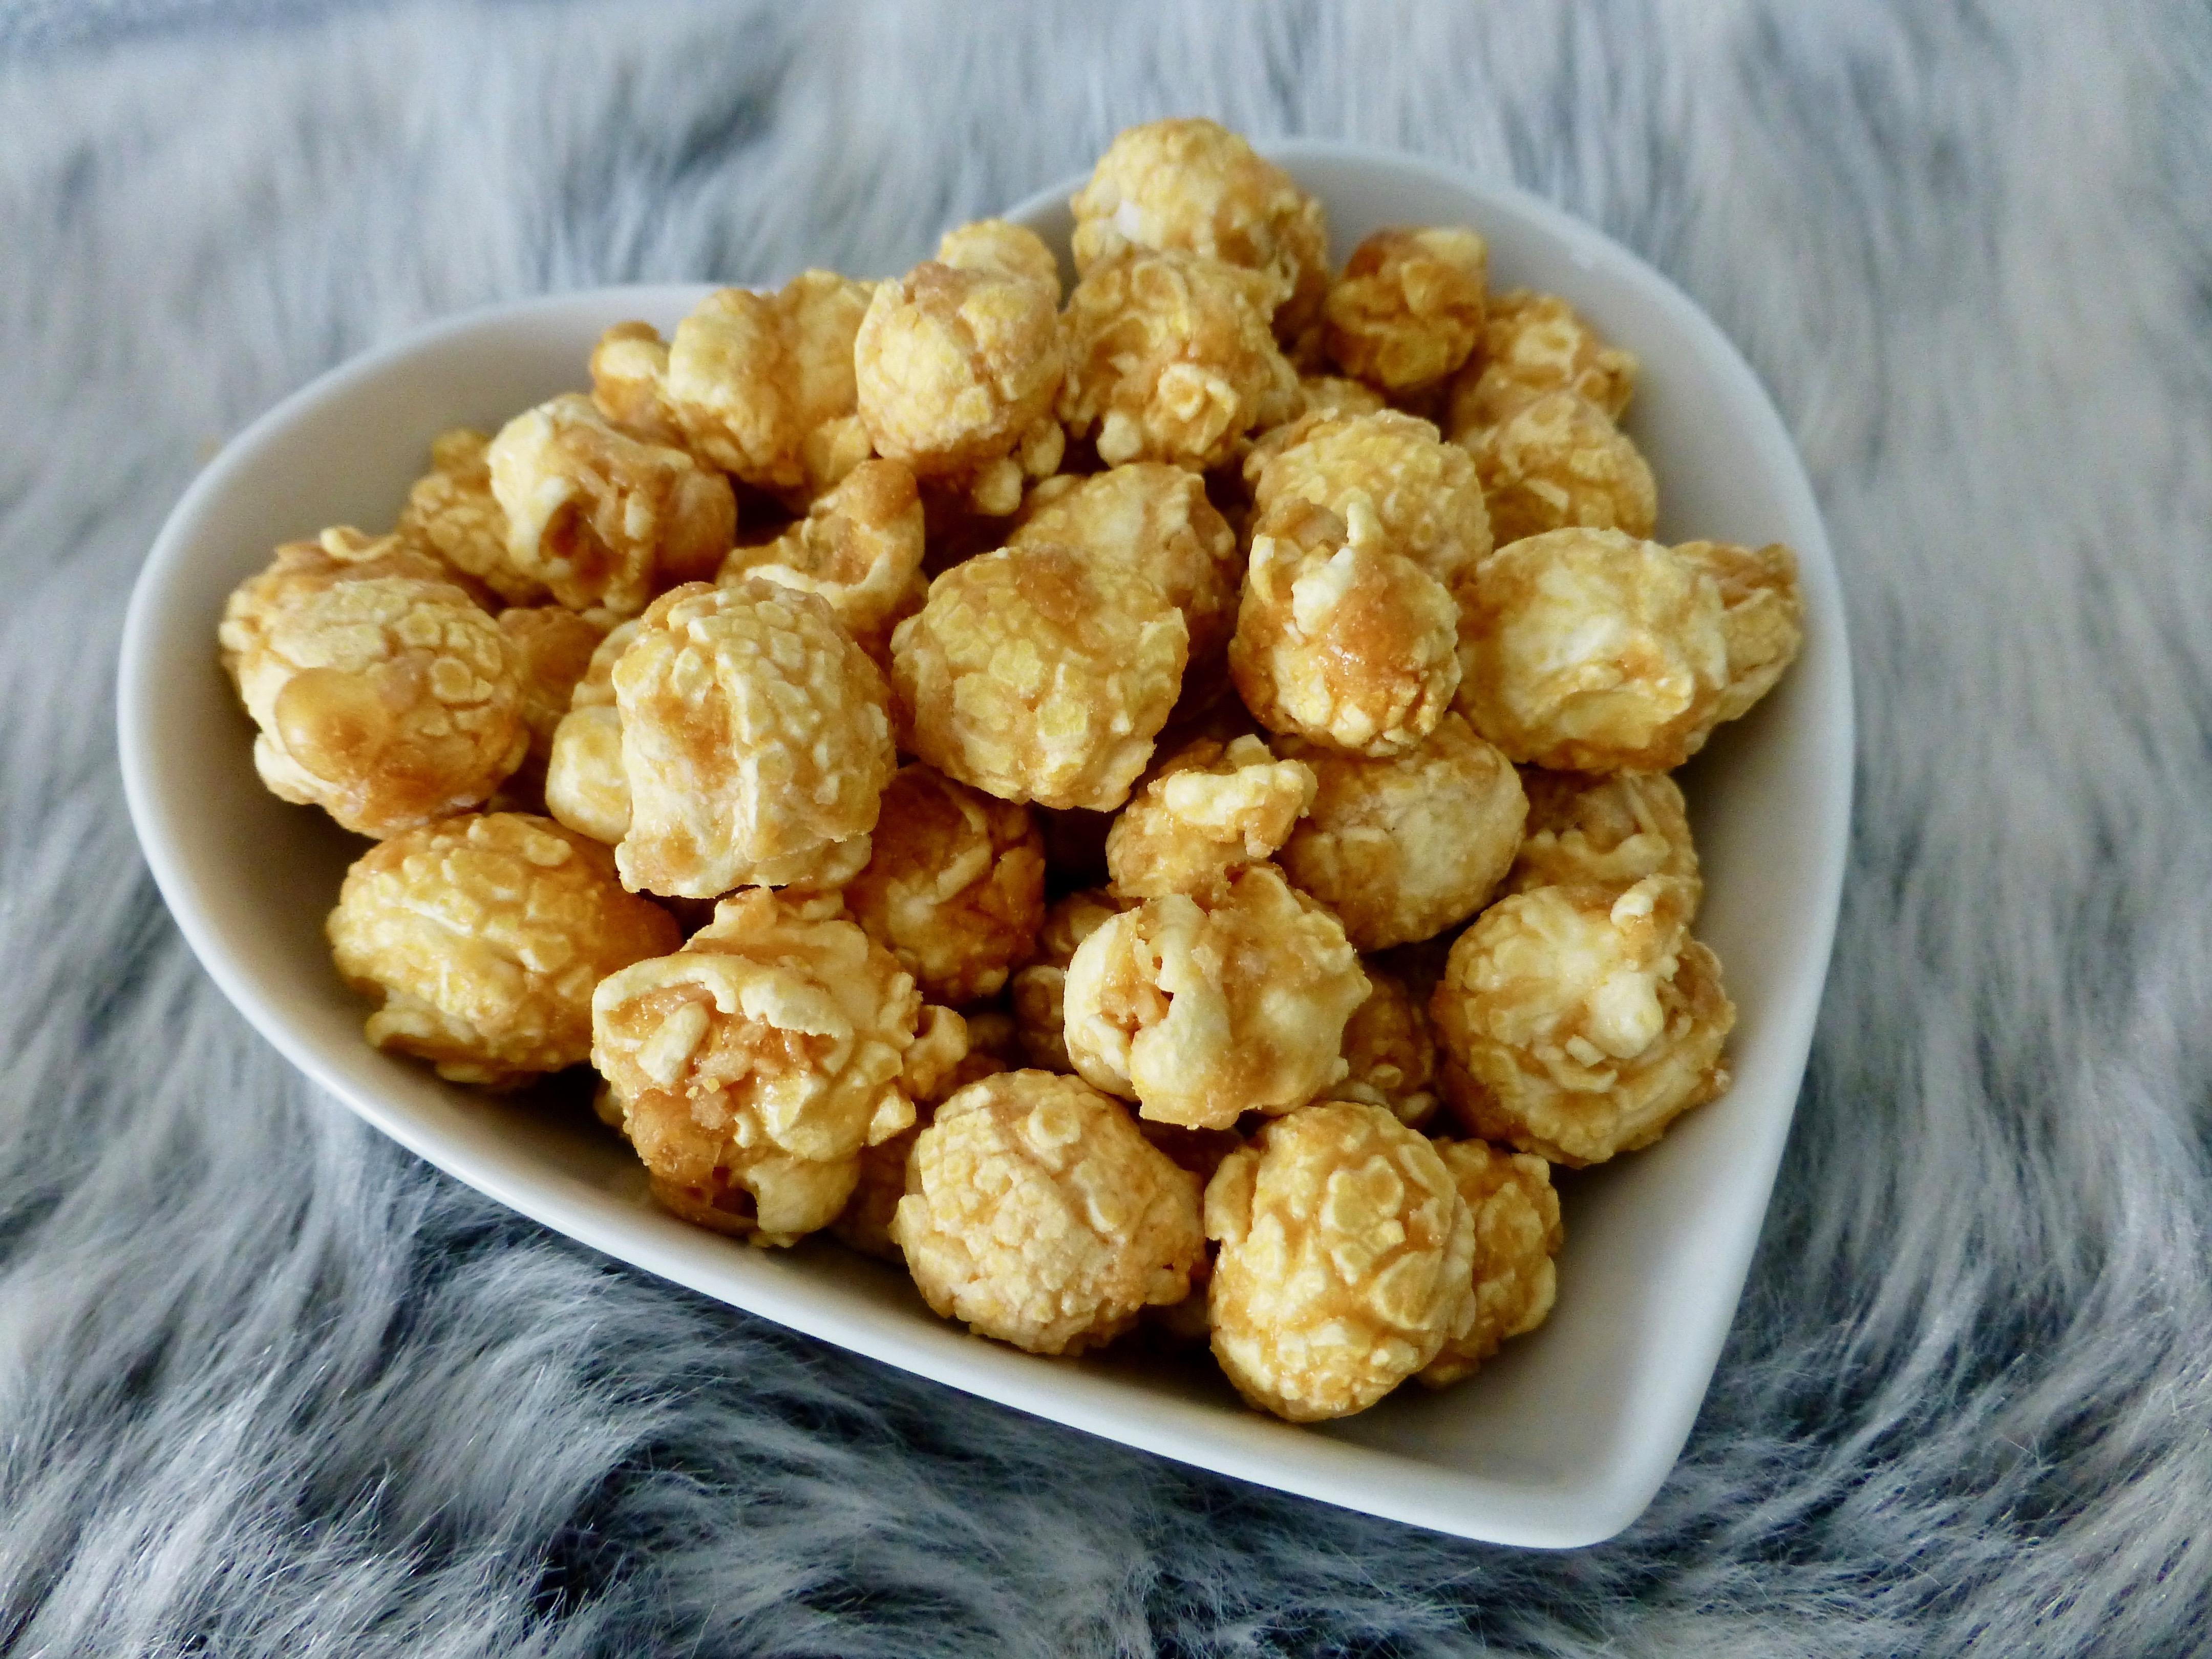 Joe & Seph's Pina Colada Popcorn